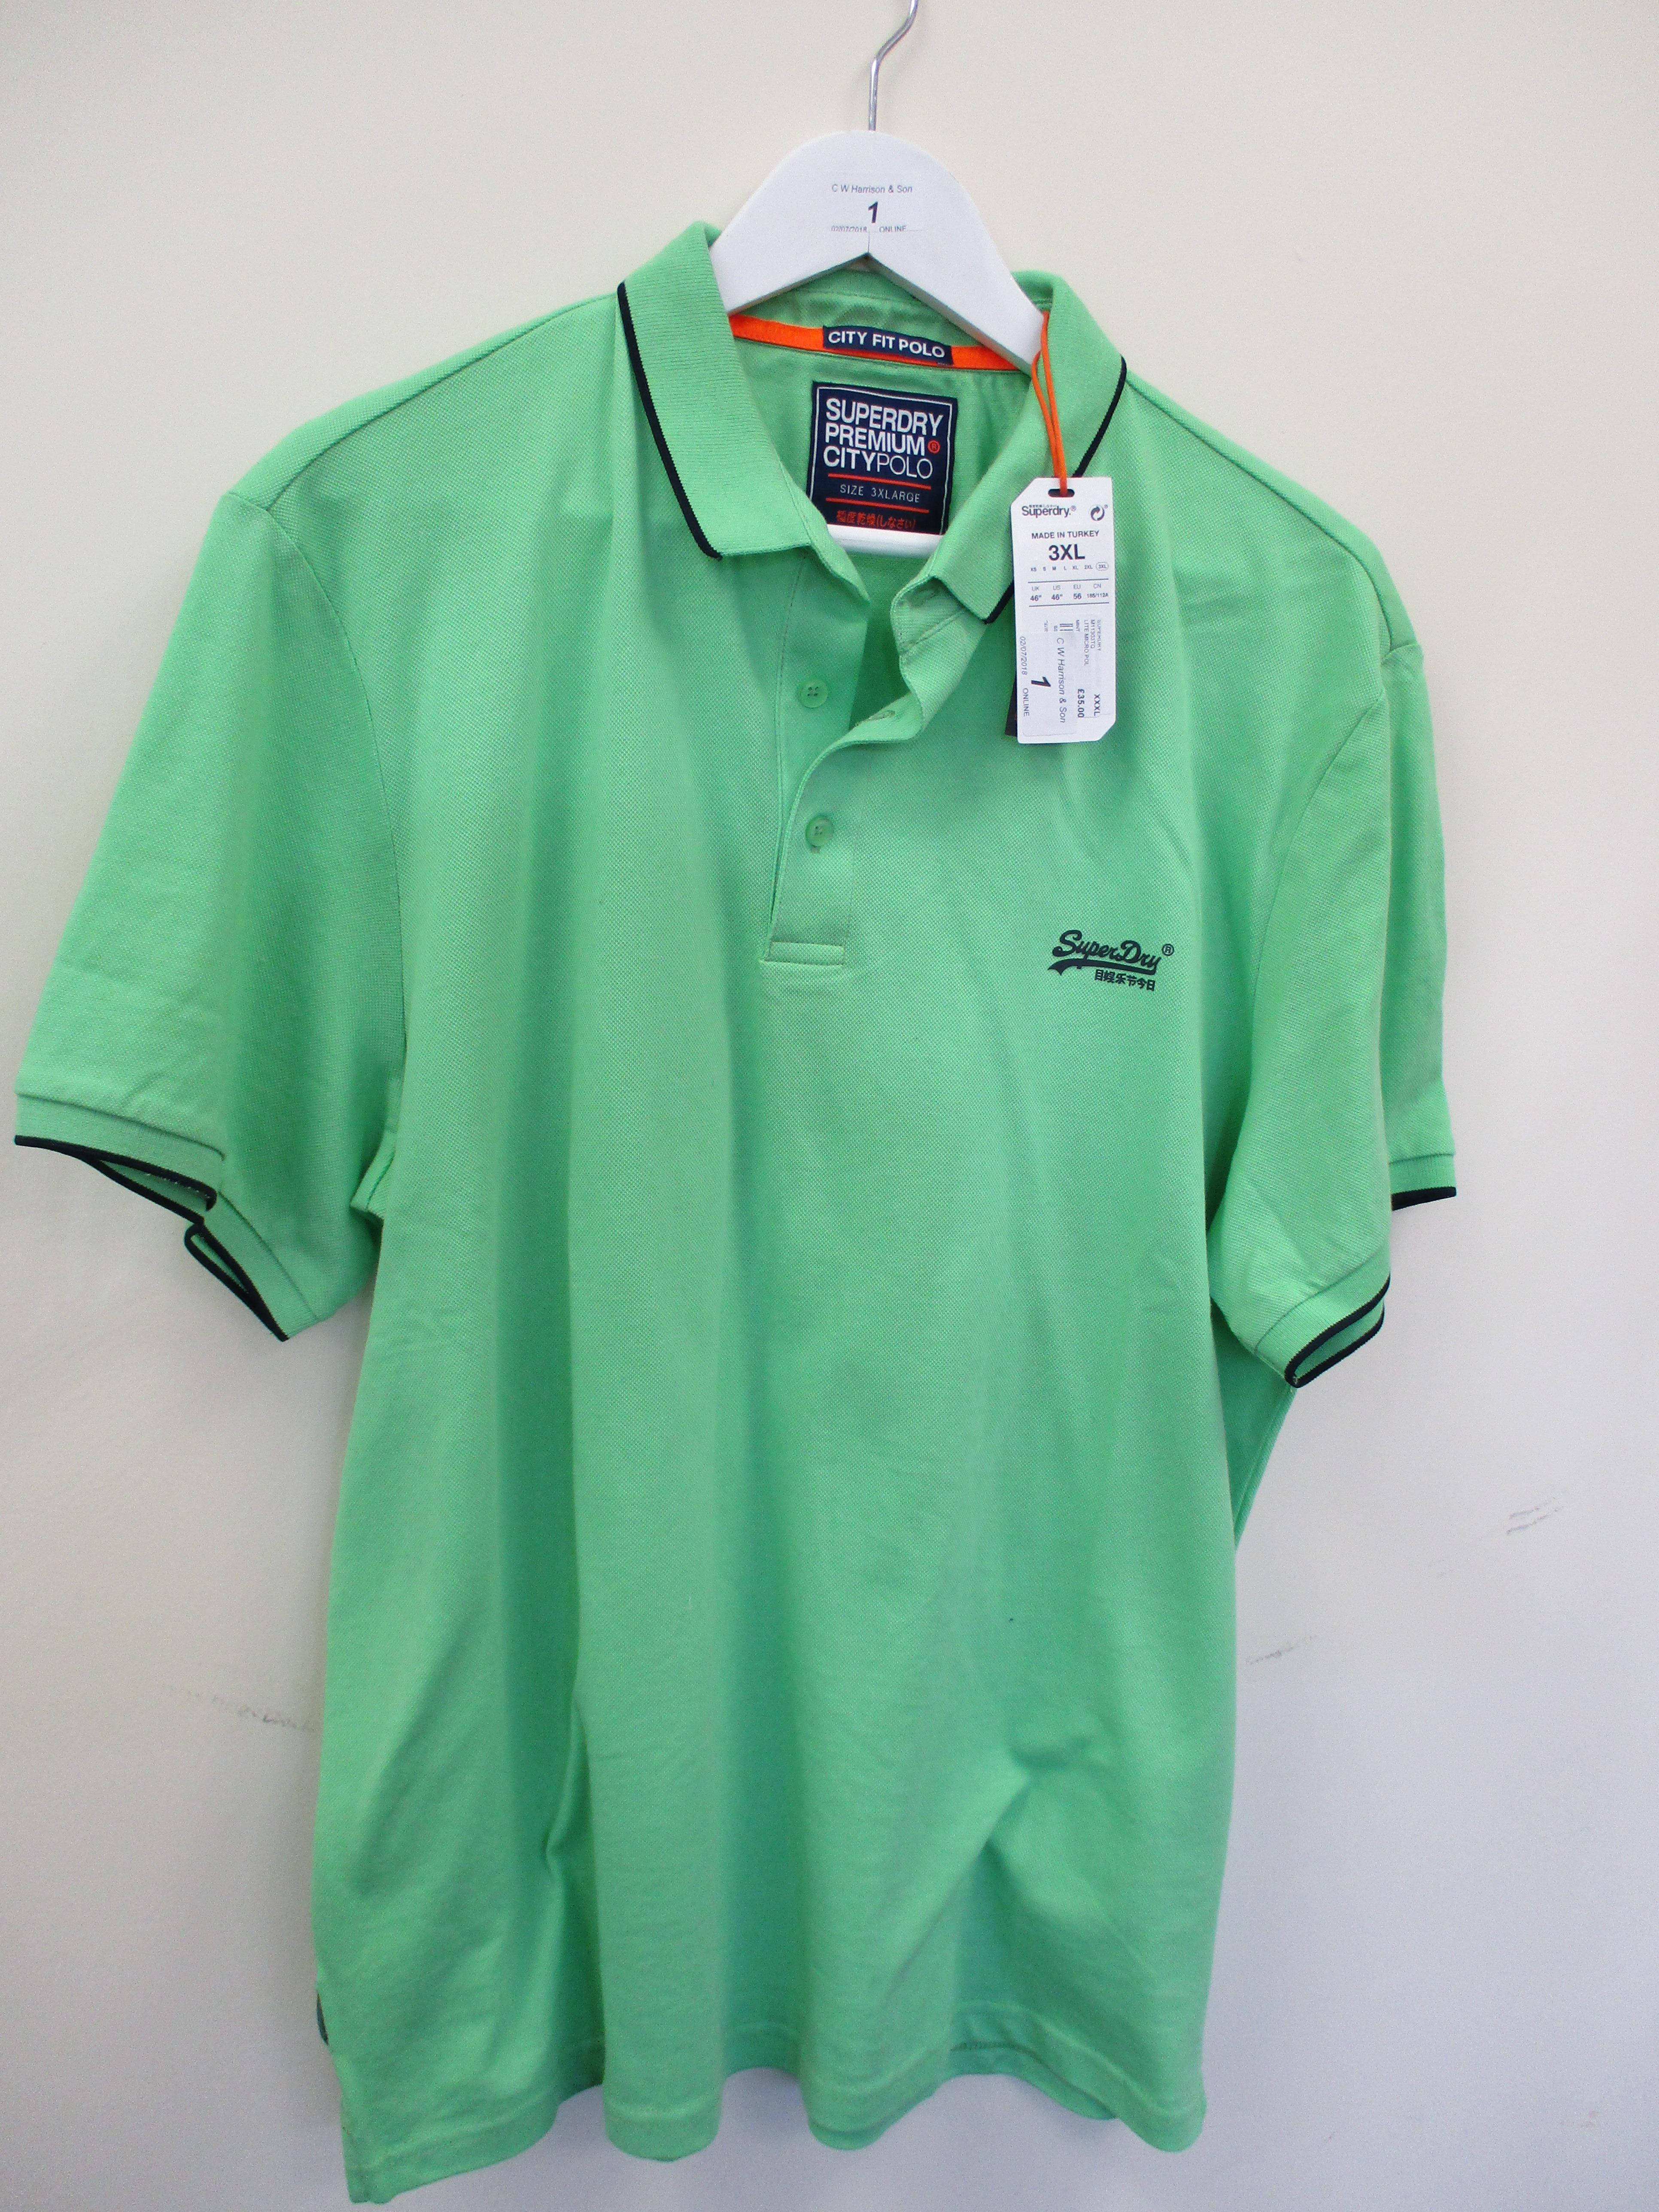 Lot 1 - Superdry lightweight edition polo shirt - green - 3XL RRP £35